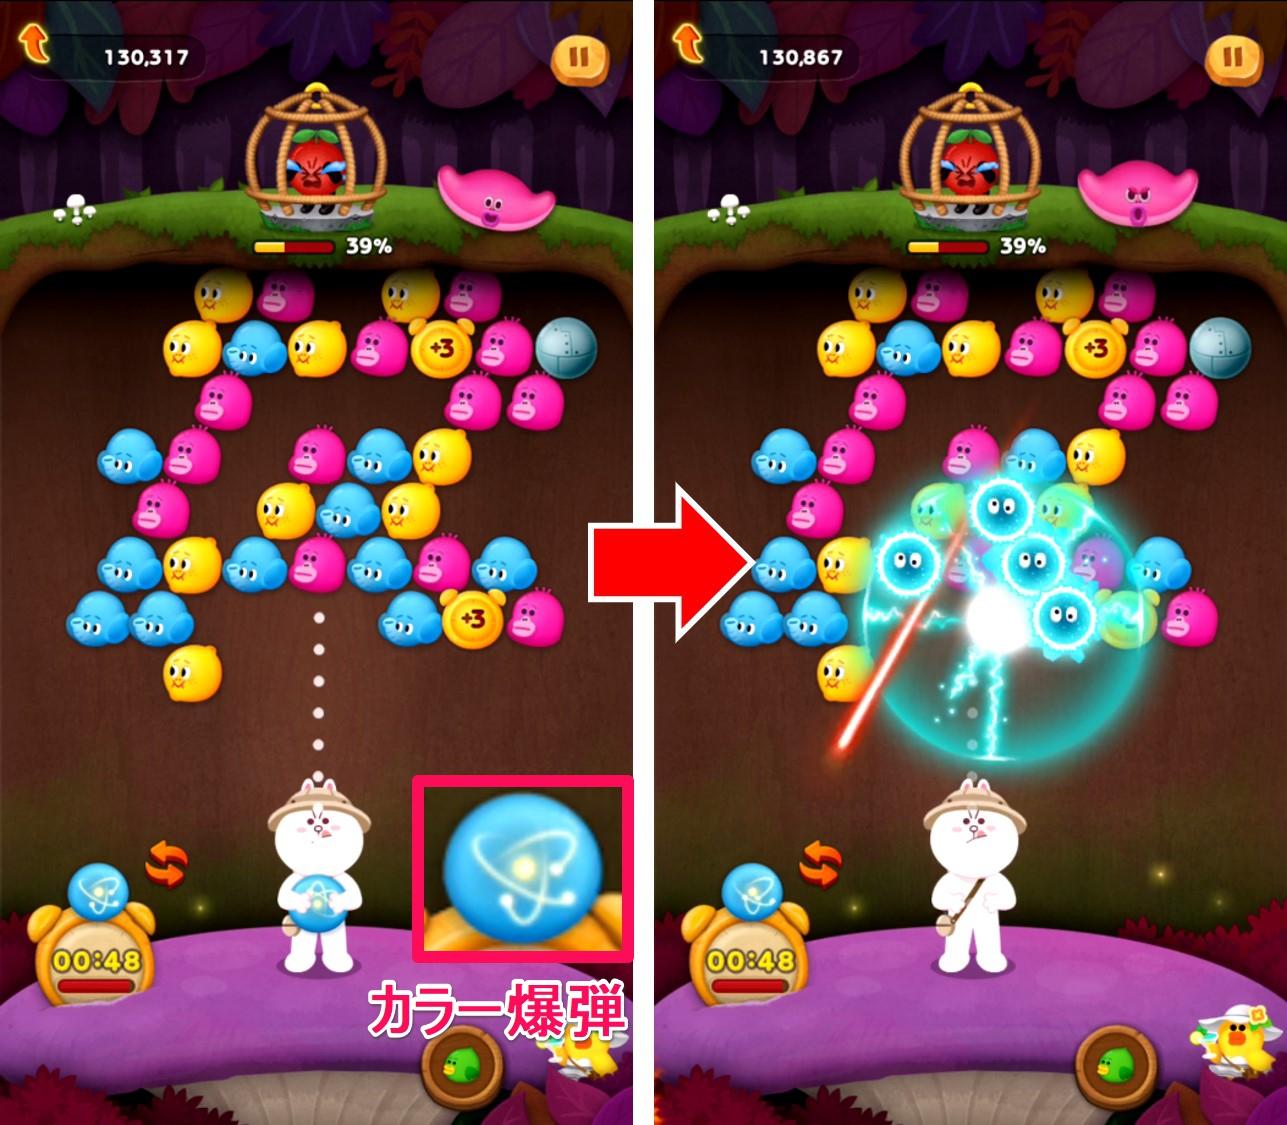 LINE バブル2【攻略】: イベント・シークレットモードの遊び方